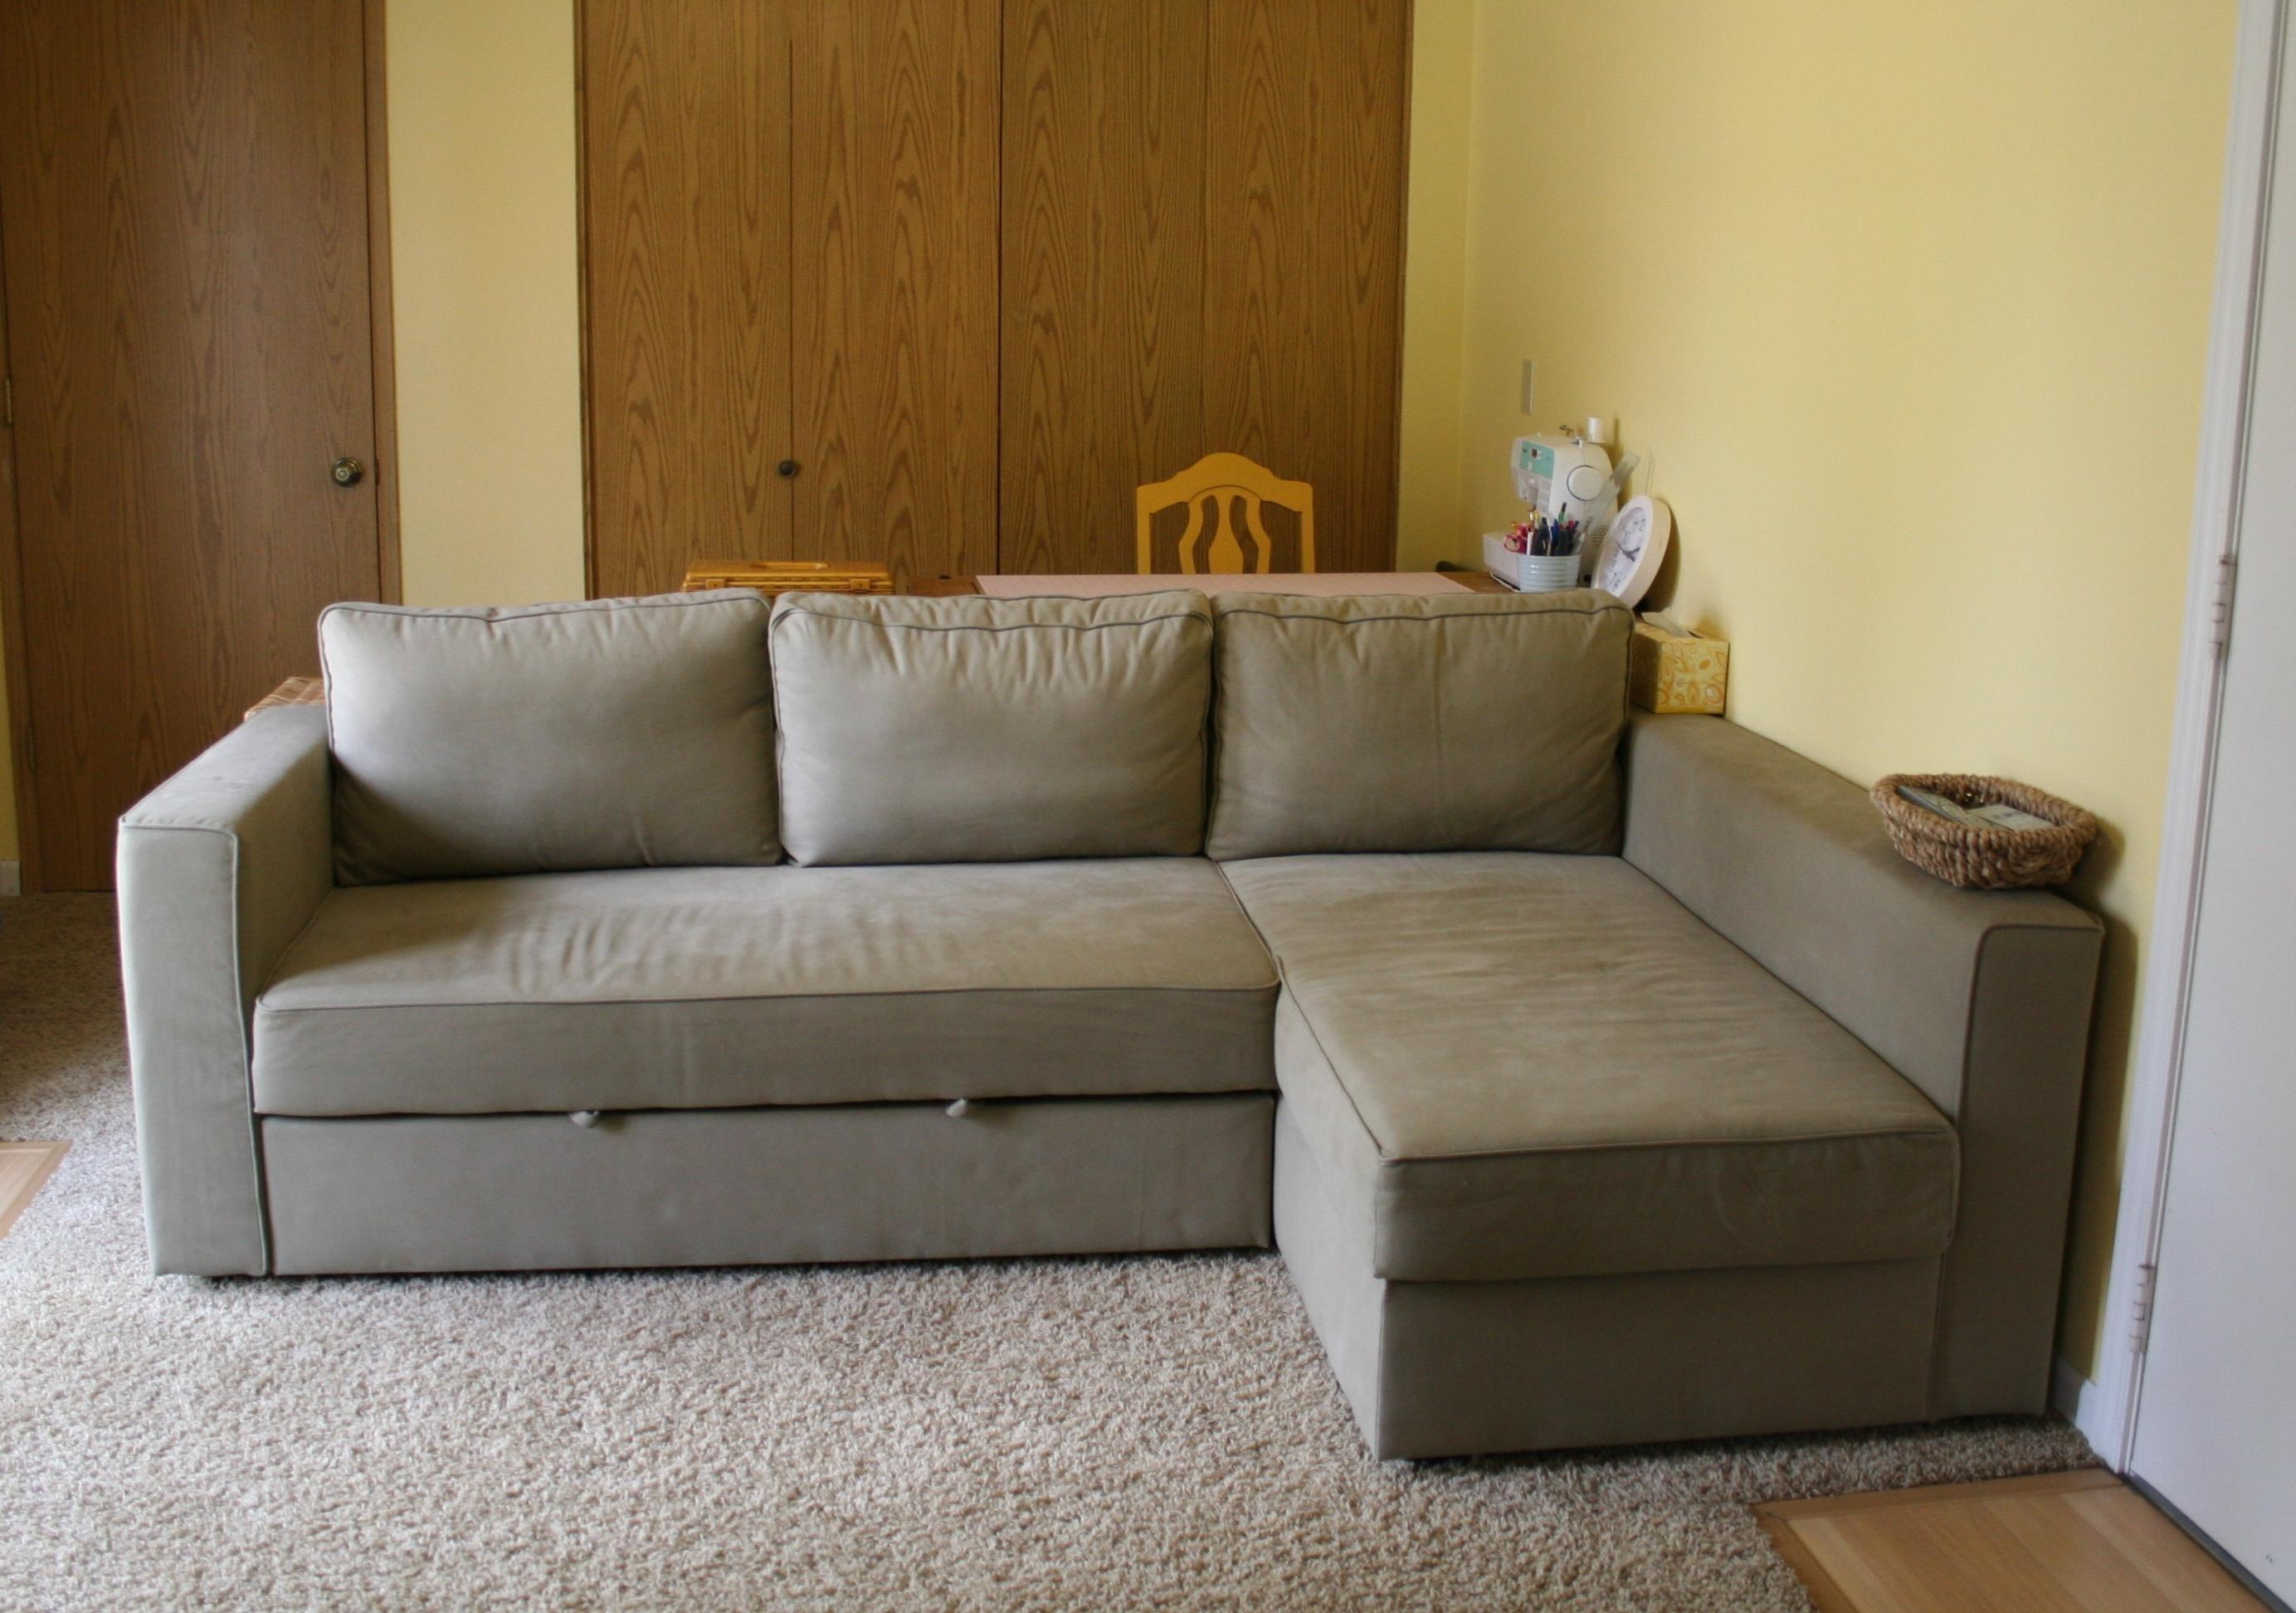 Manstad Ikea Sofa – Leather Sectional Sofa Regarding Manstad Sofa Bed Ikea (View 7 of 20)